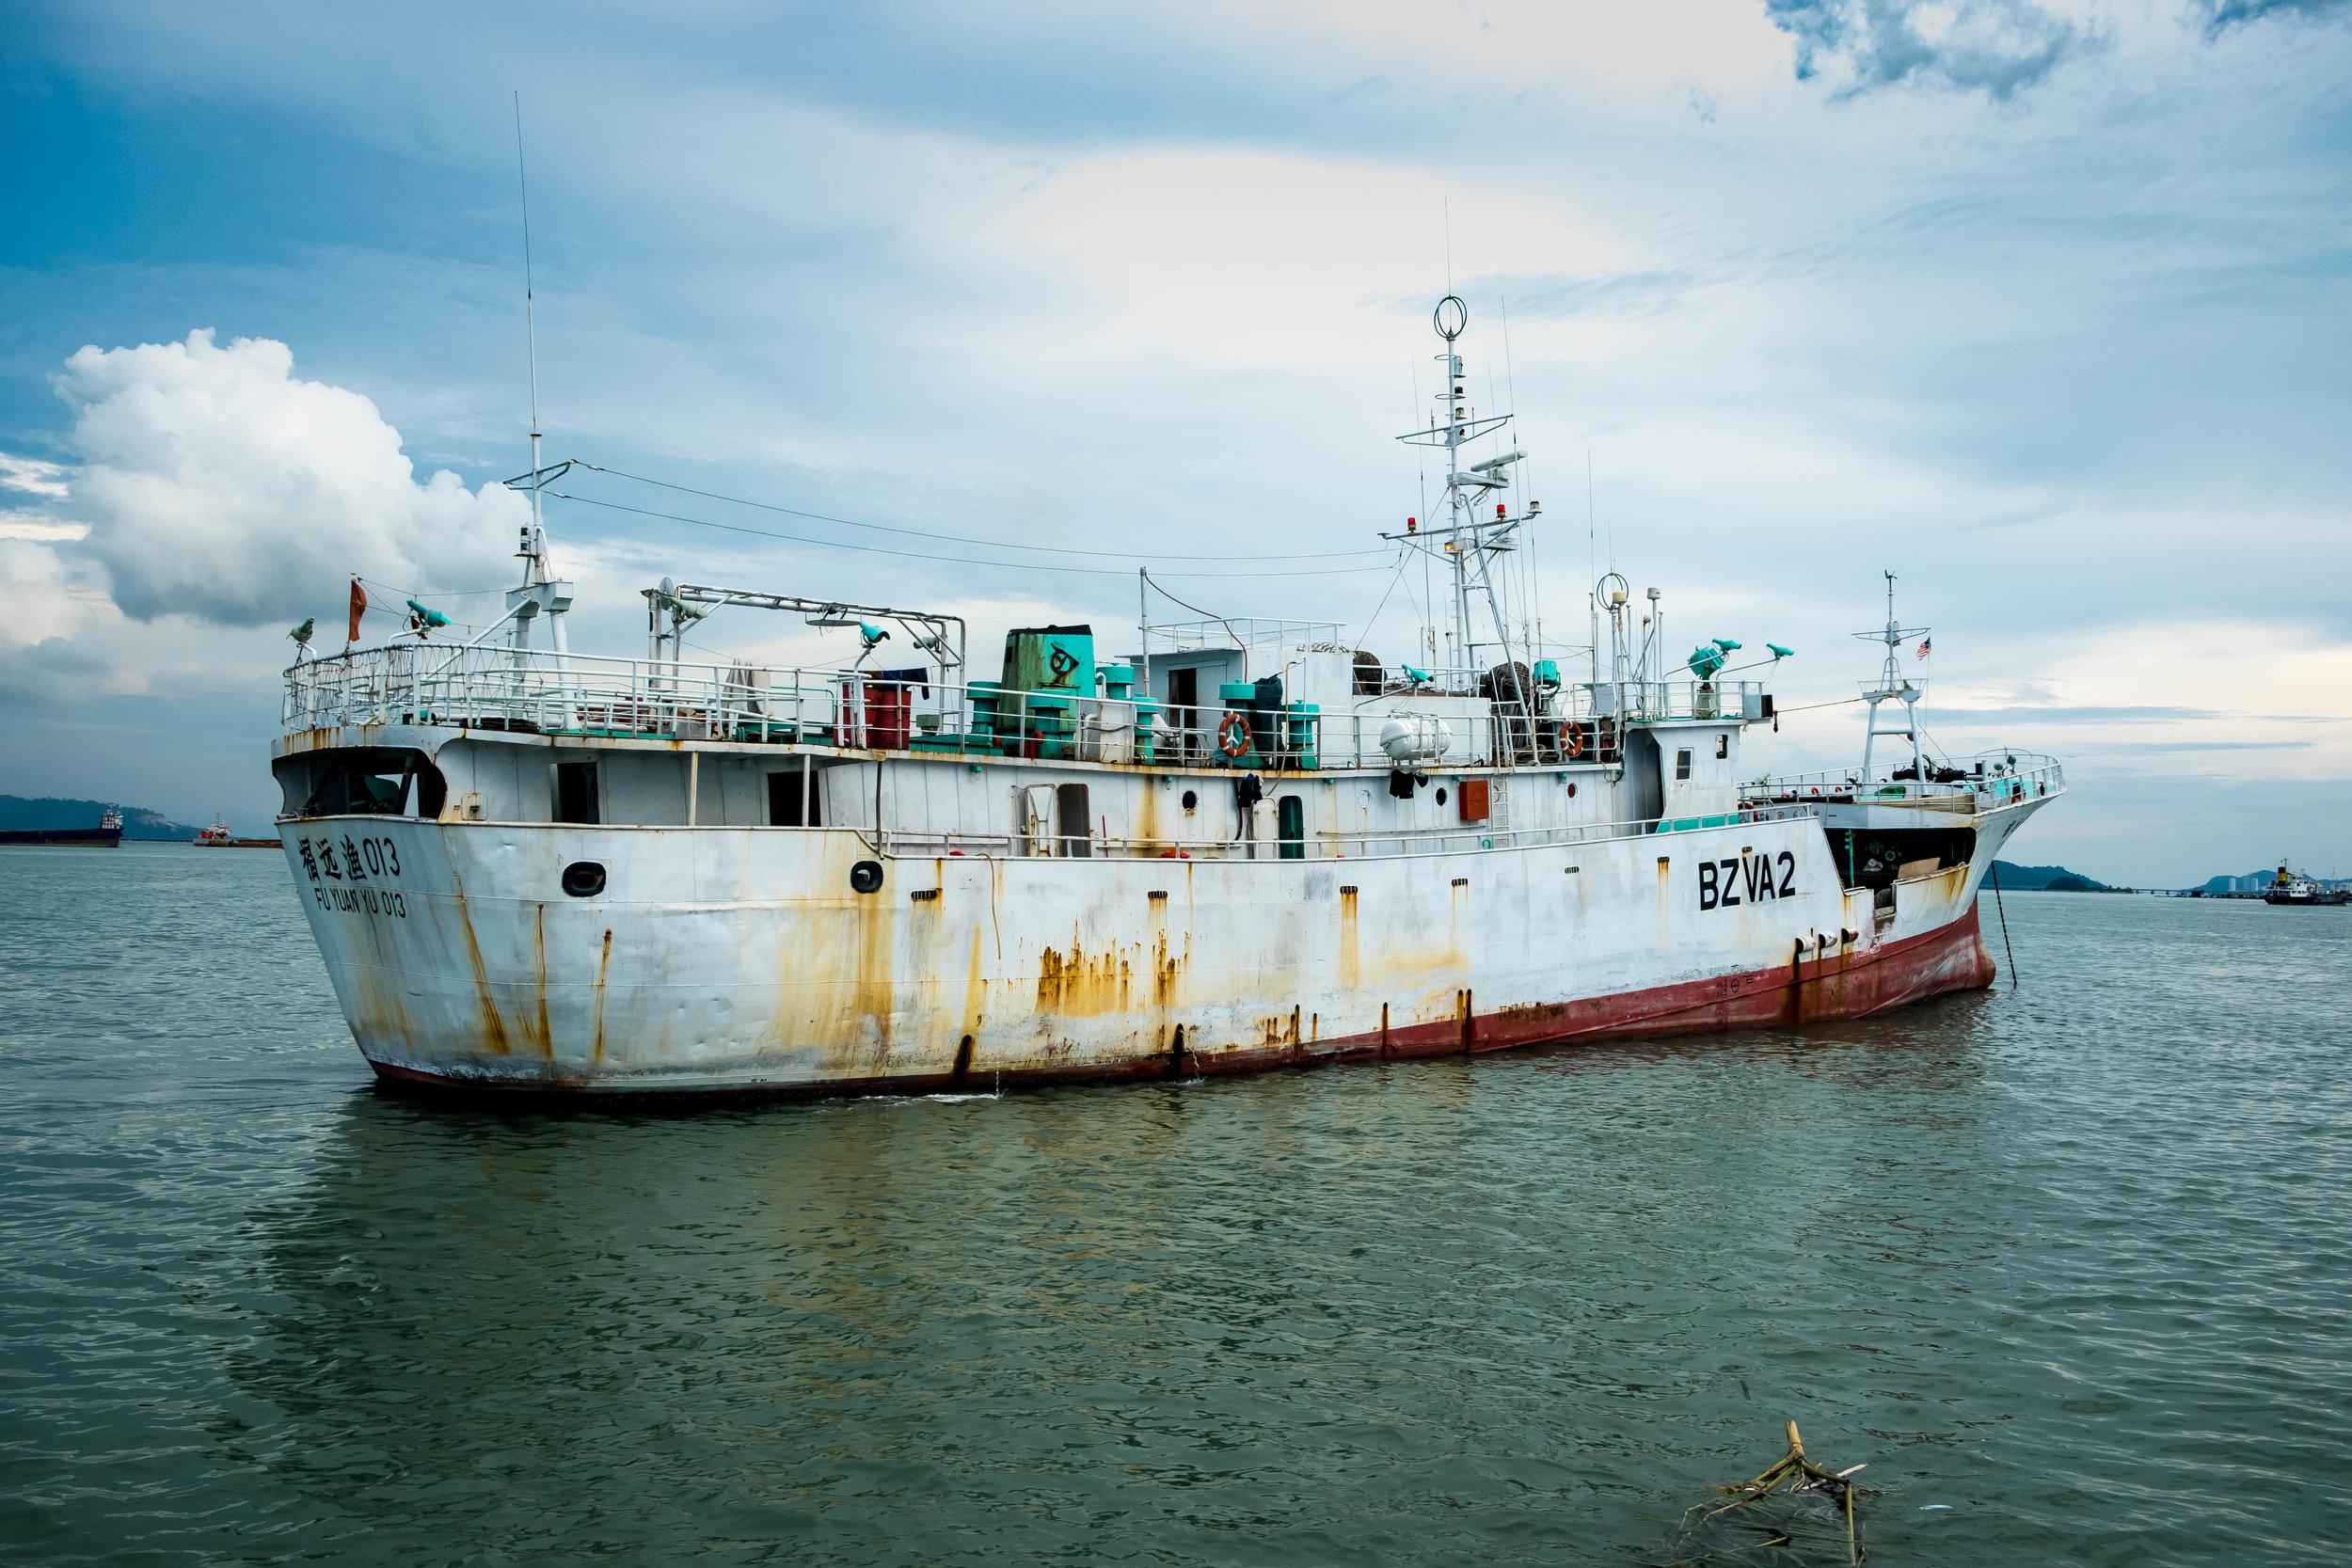 Junkboat in Penang